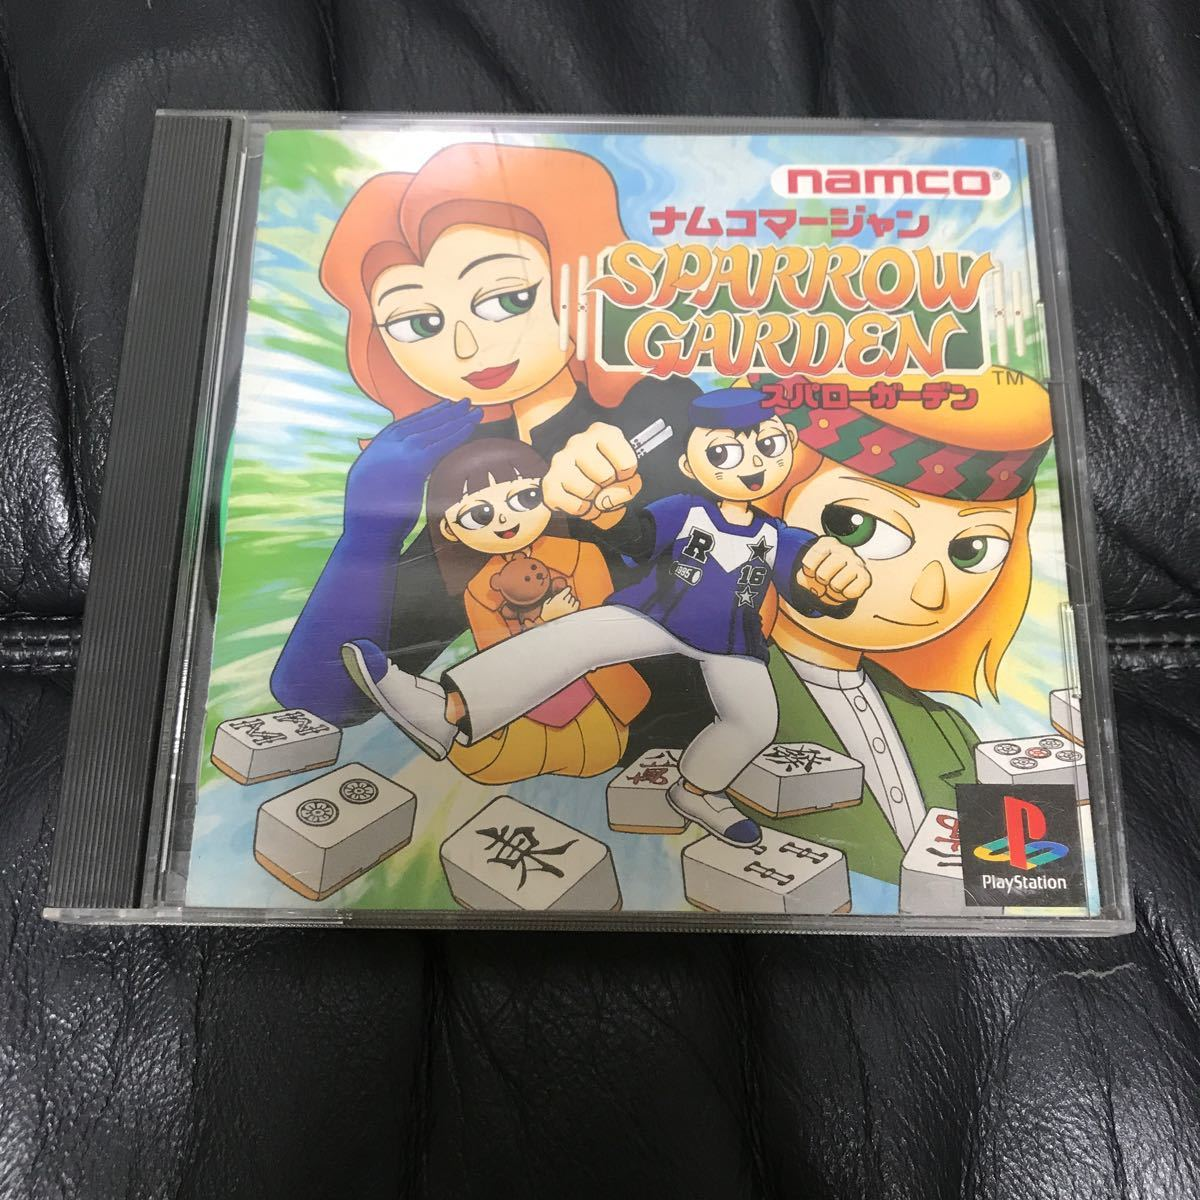 PlayStation ナムコマージャン スパロガーデン